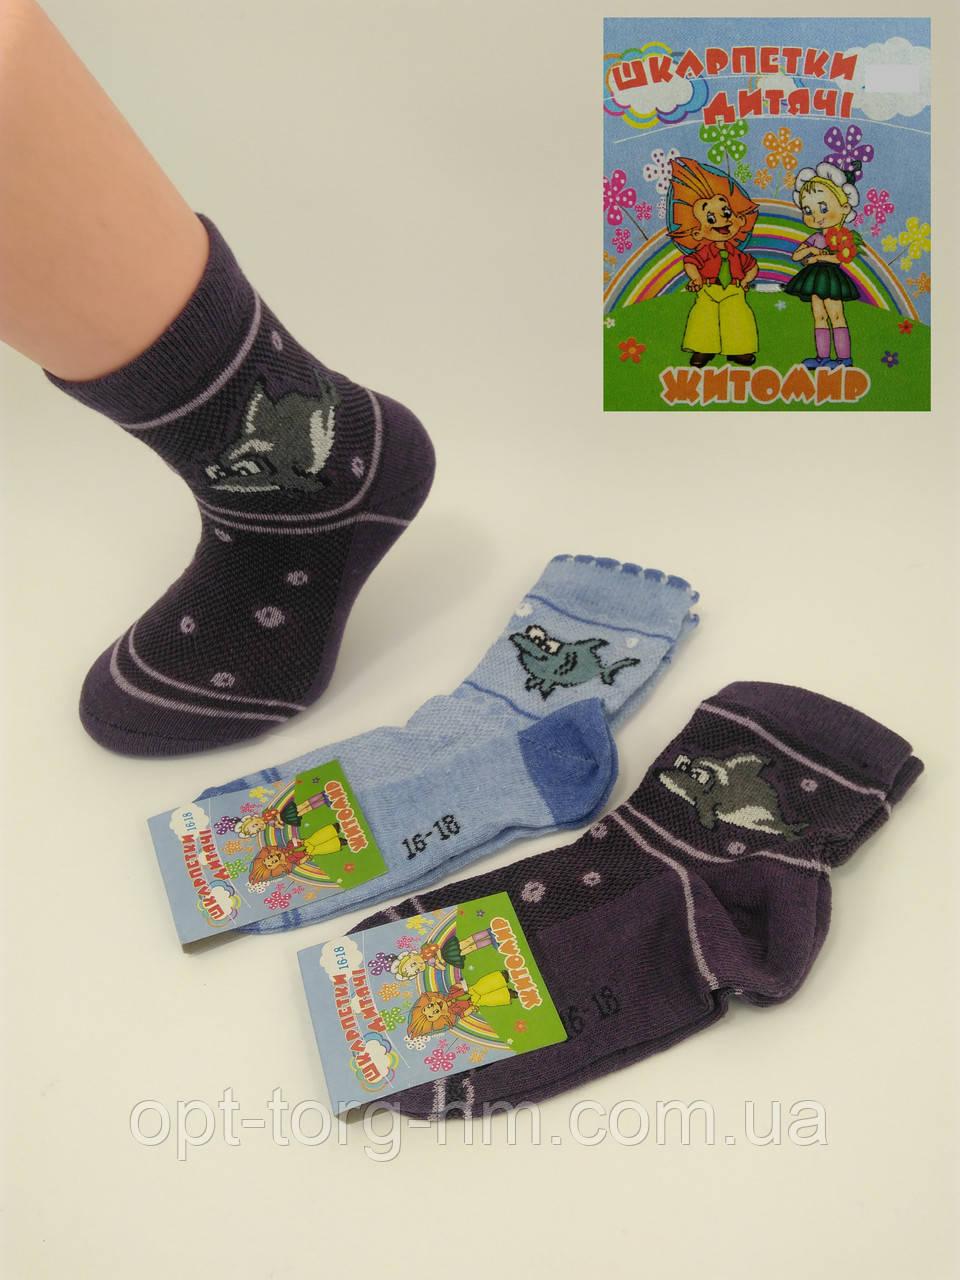 Детские носки сетка 16-18 (25-28обувь)